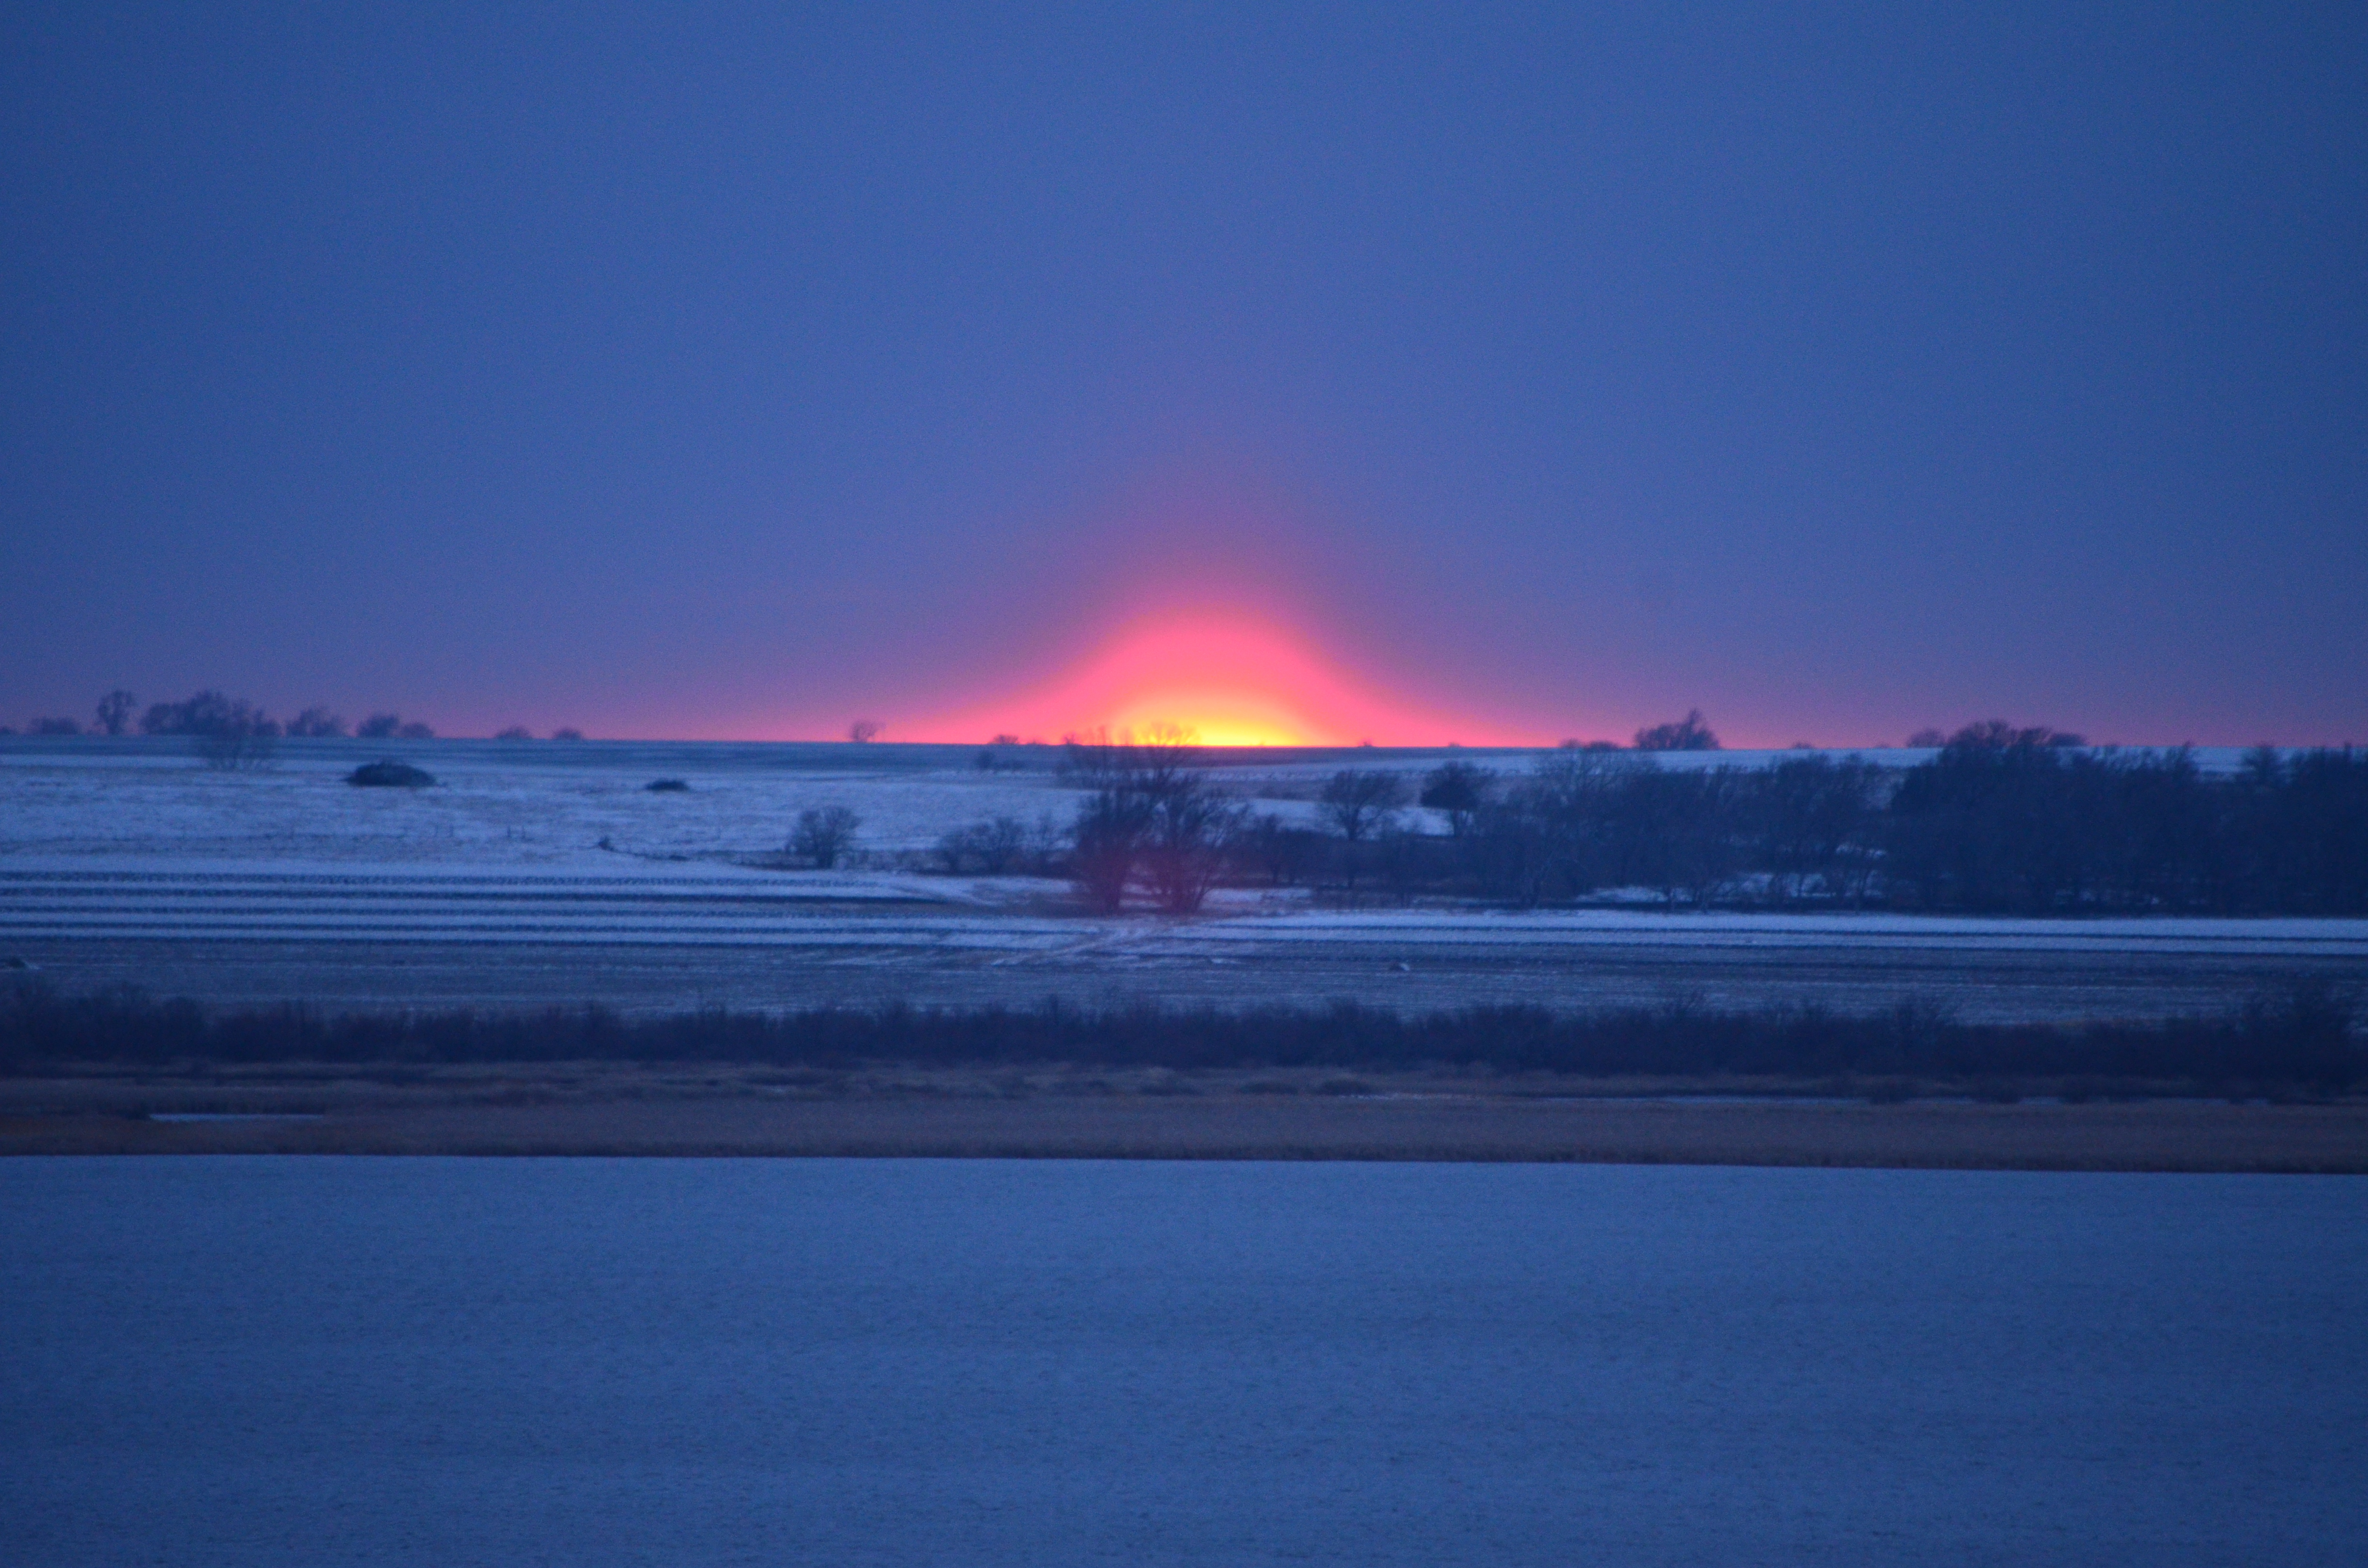 Kansas jewell county randall - Snowy Sunset Ks Kansas Randall Postoffices Jewellcounty